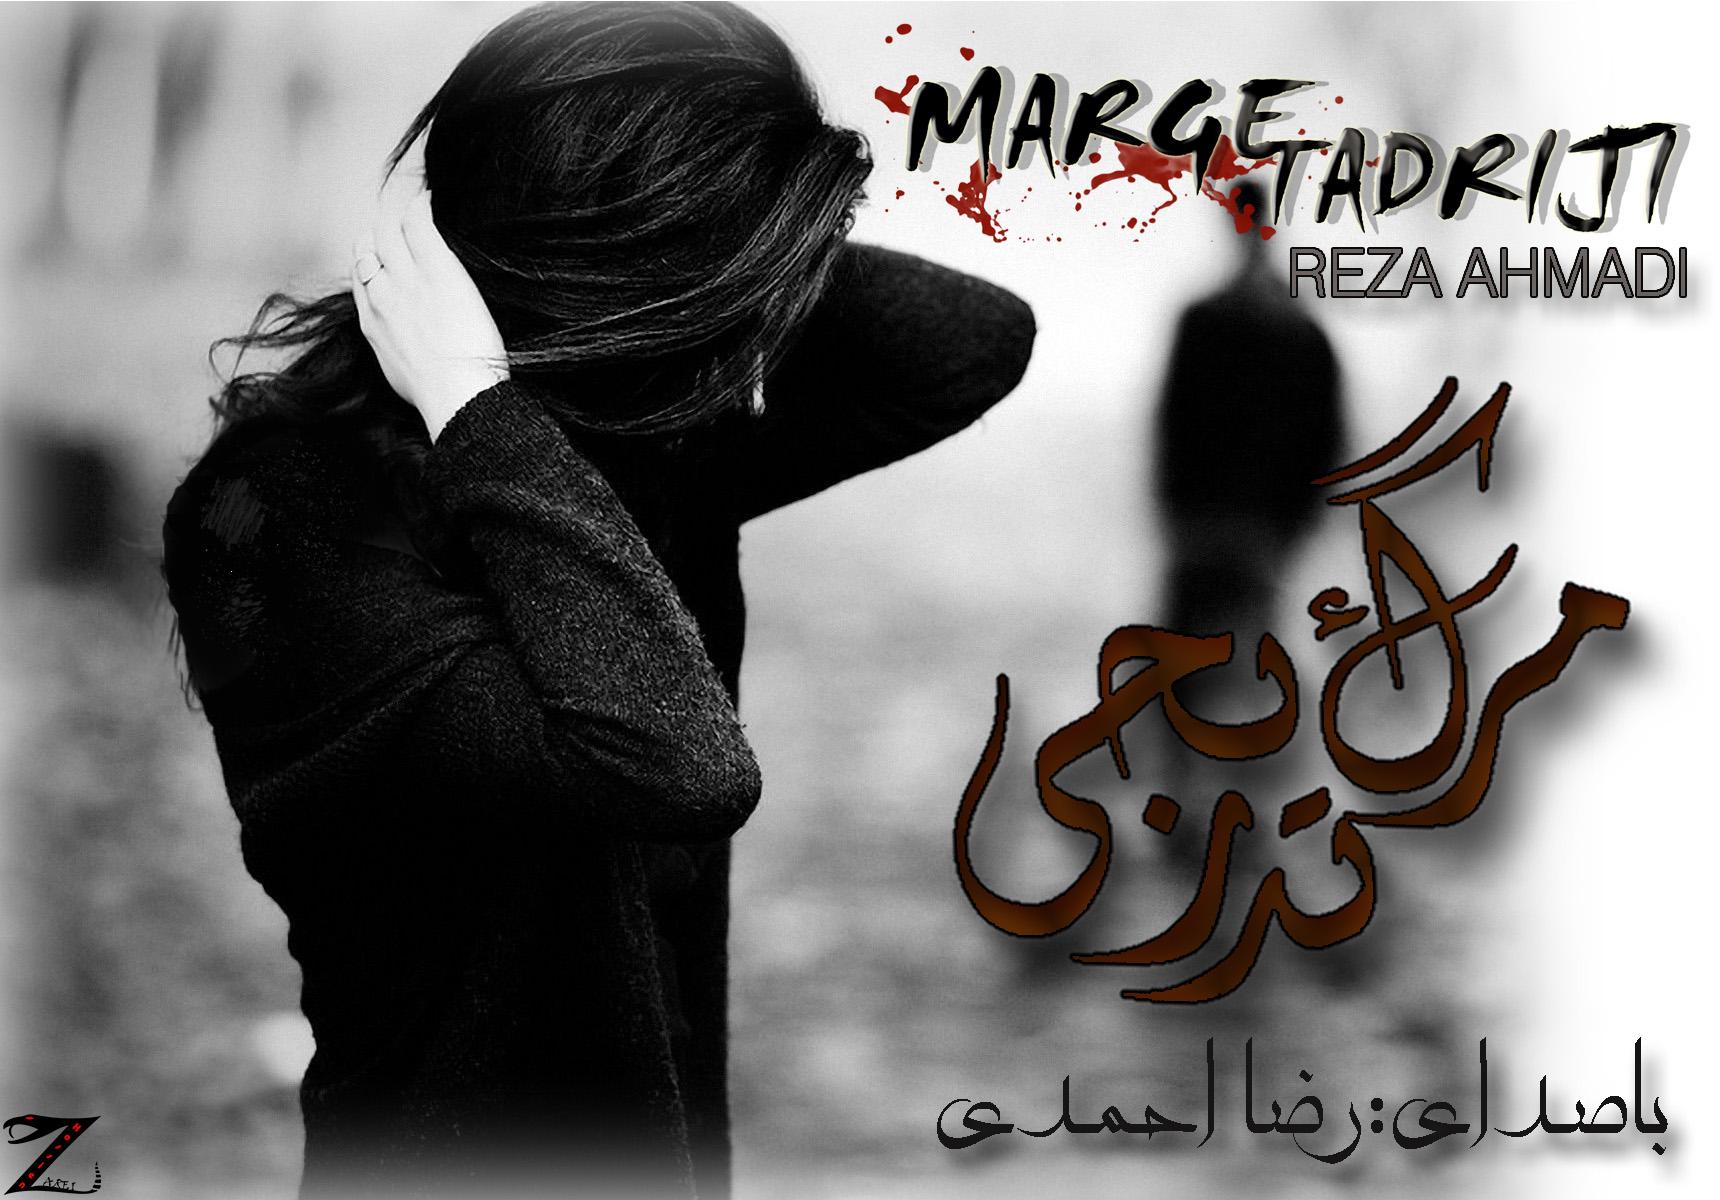 IMG_Reza_Ahmadi_Marge_Tadriji_.jpg